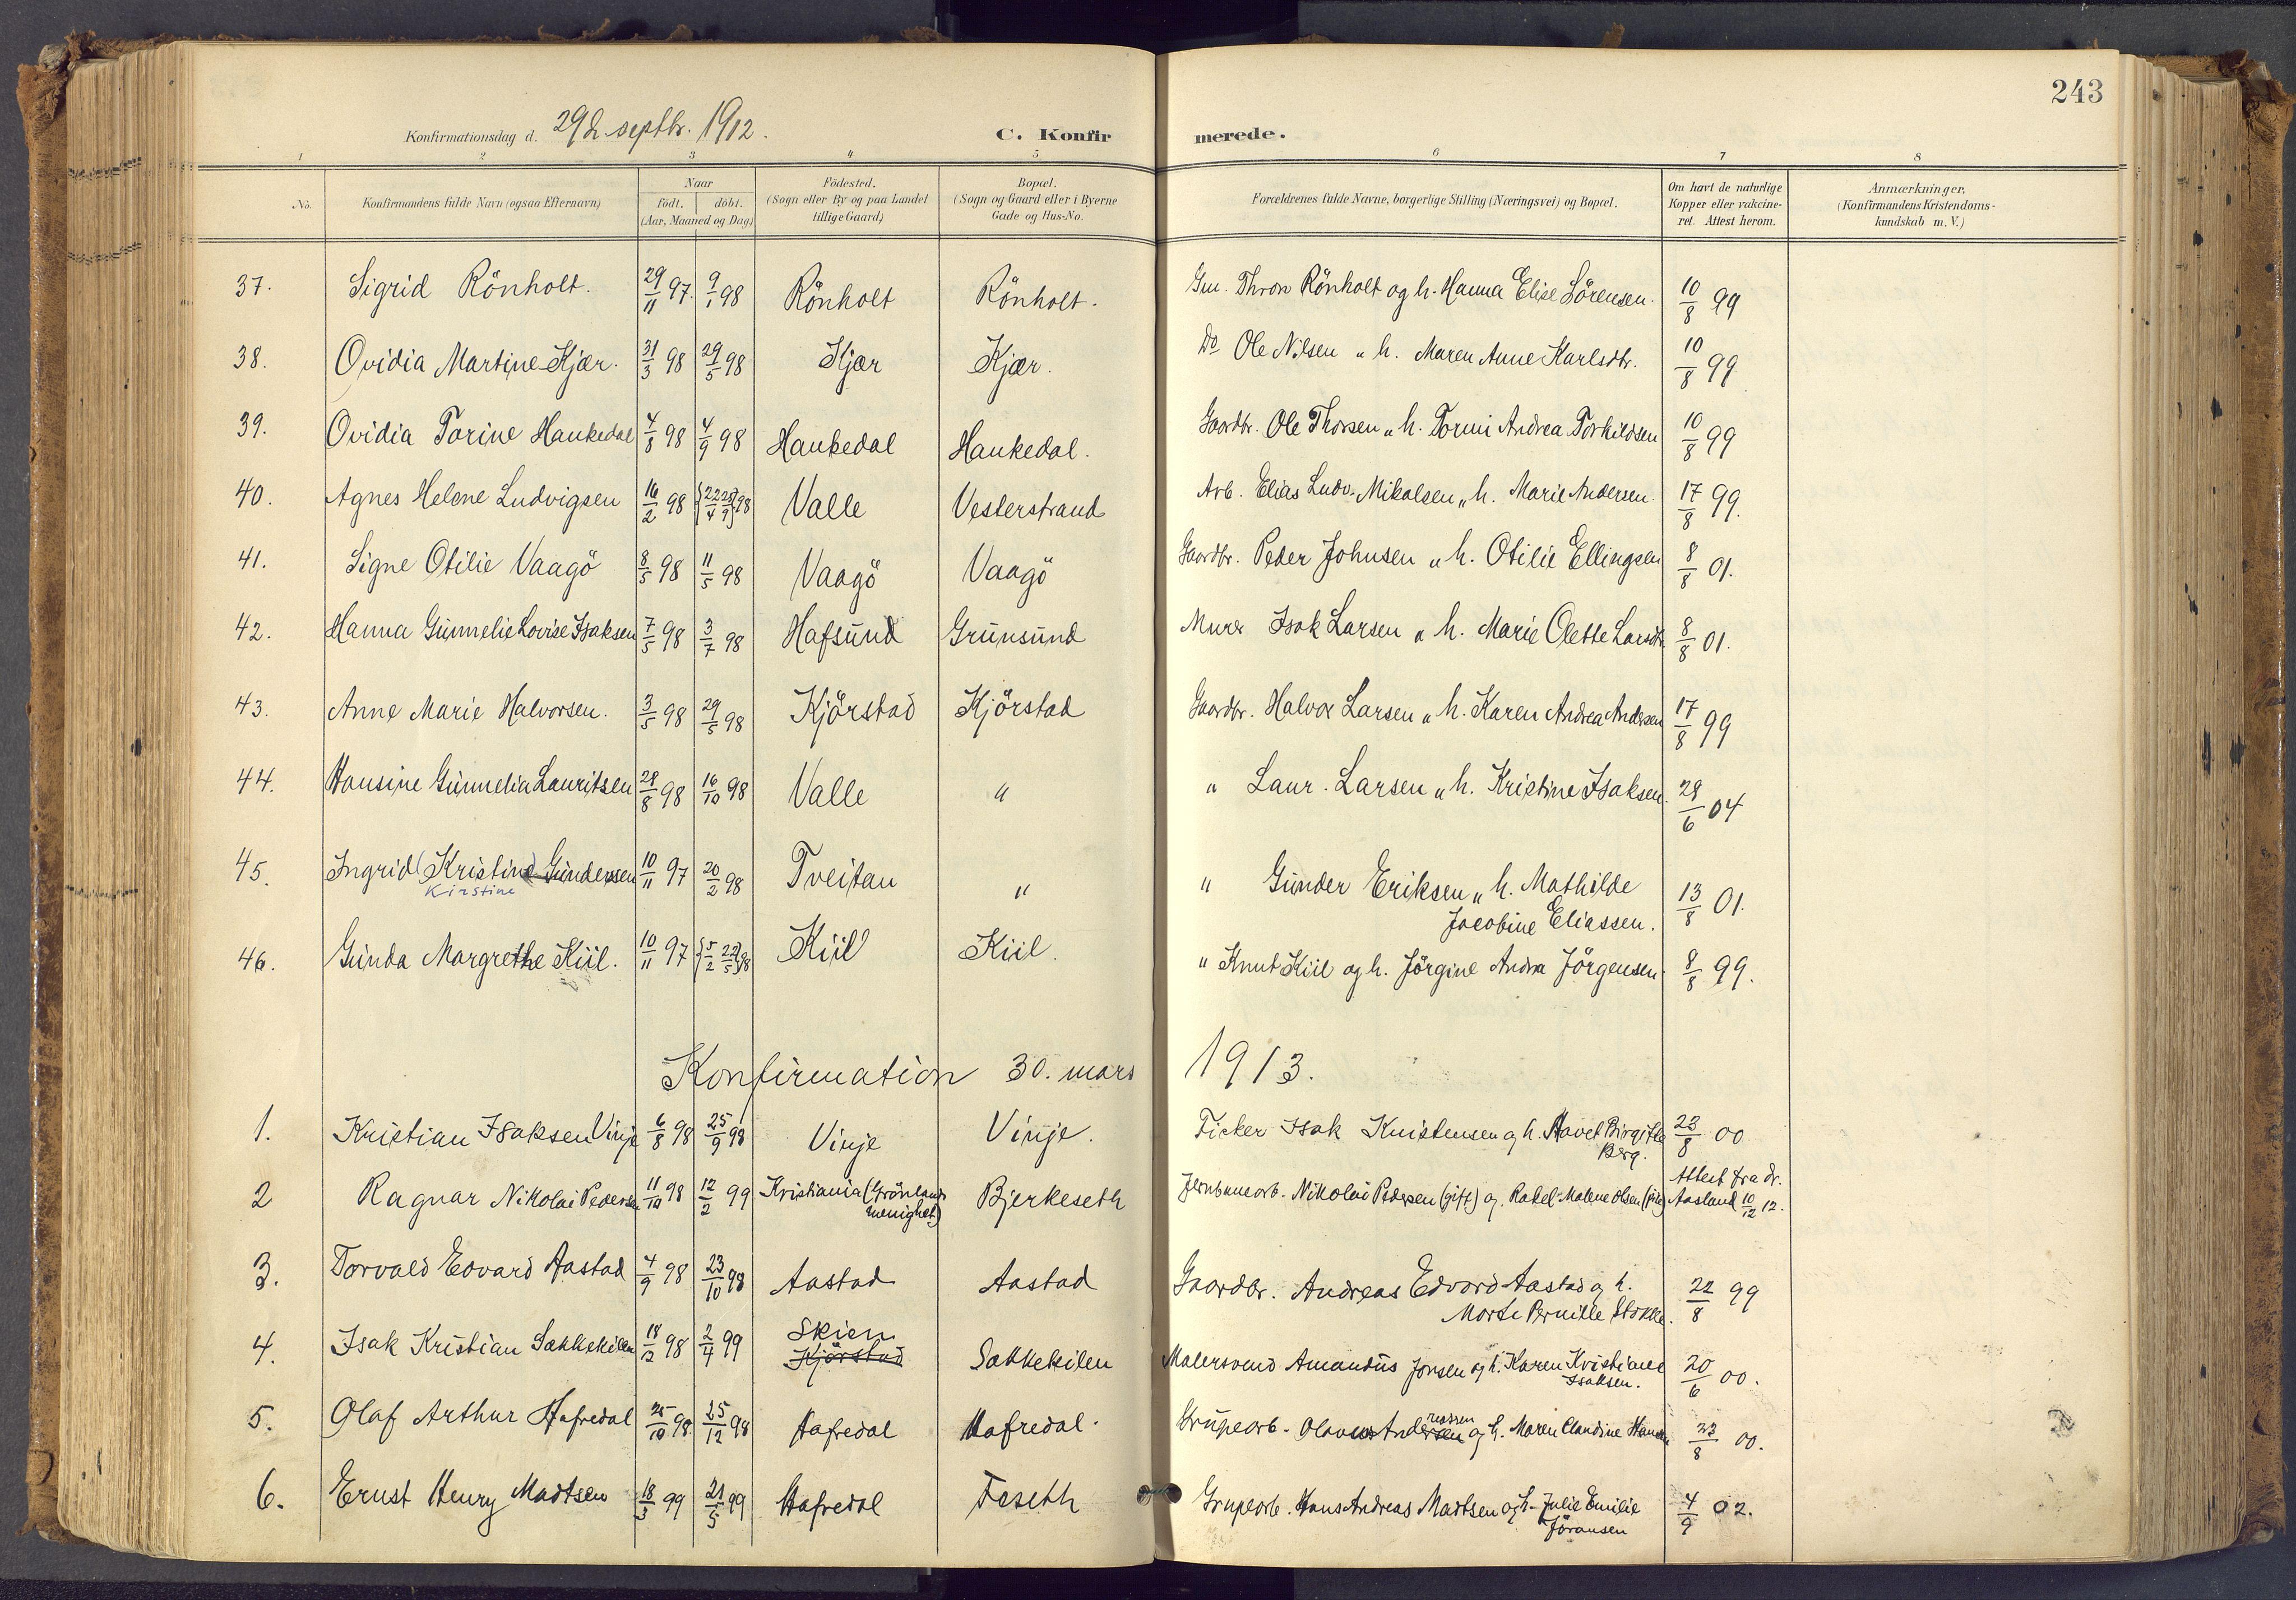 SAKO, Bamble kirkebøker, F/Fa/L0009: Ministerialbok nr. I 9, 1901-1917, s. 243